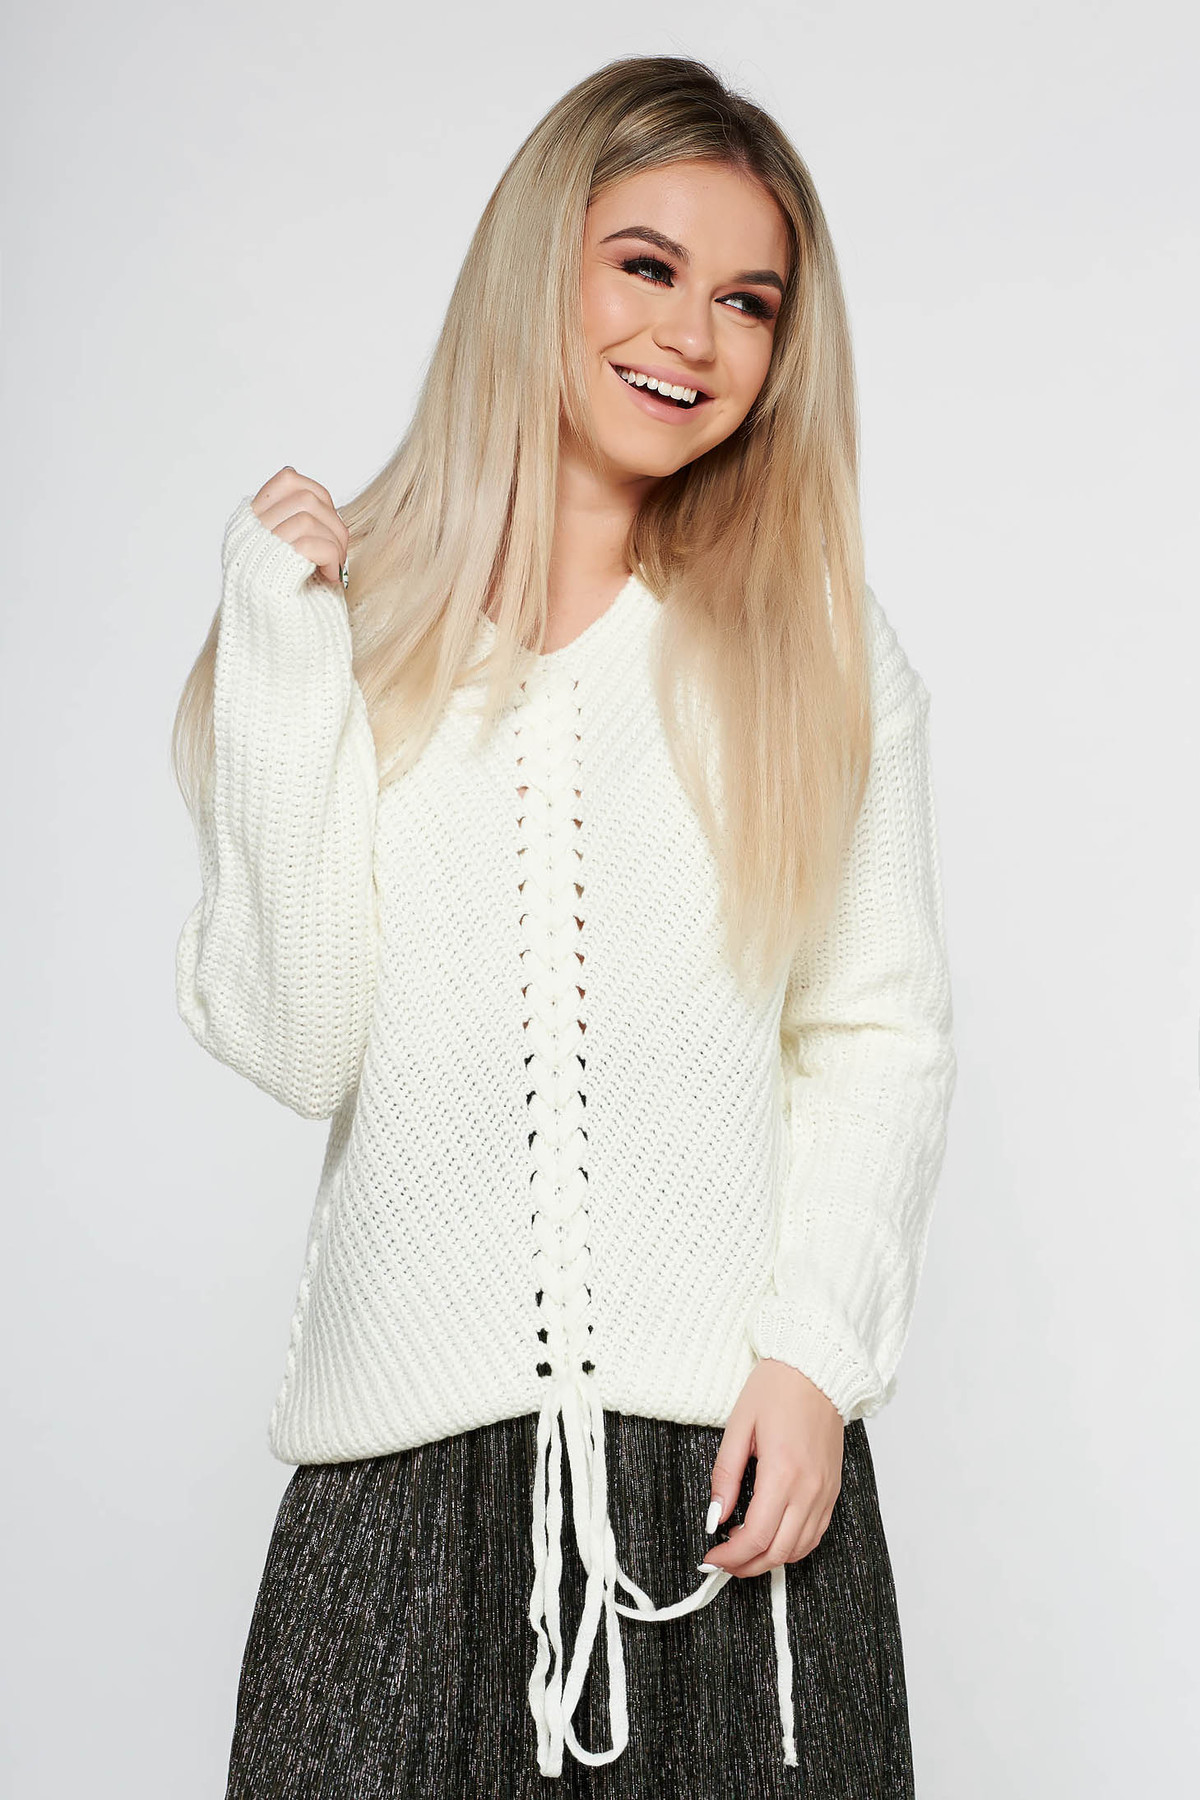 Pulover SunShine alb casual cu croi larg din material tricotat accesorizat cu snur